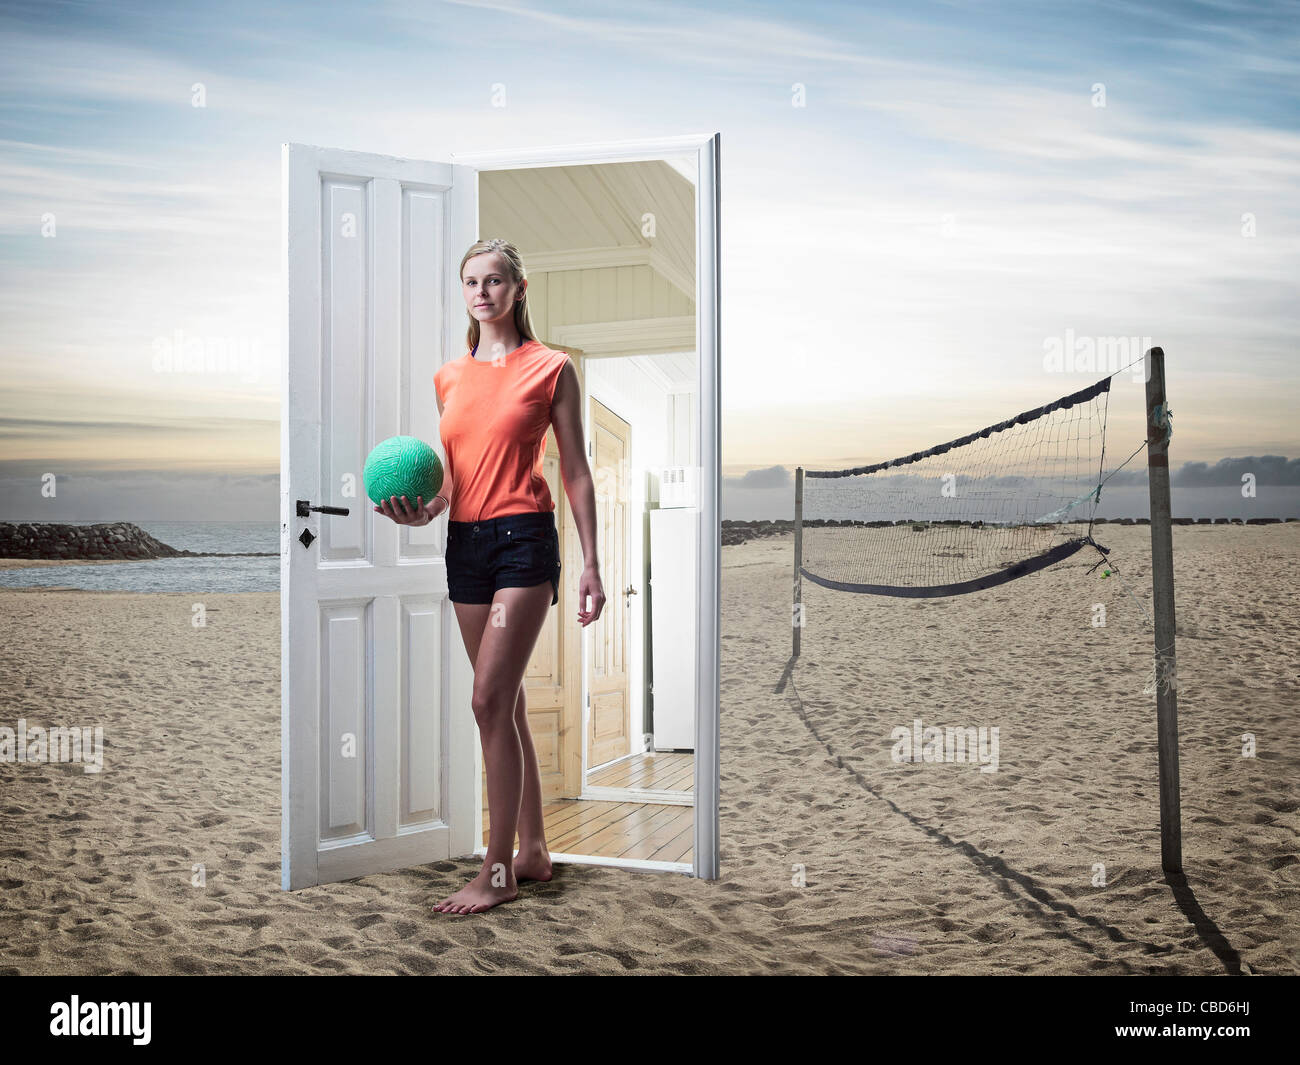 Mujer saliendo de puerta en la playa Imagen De Stock